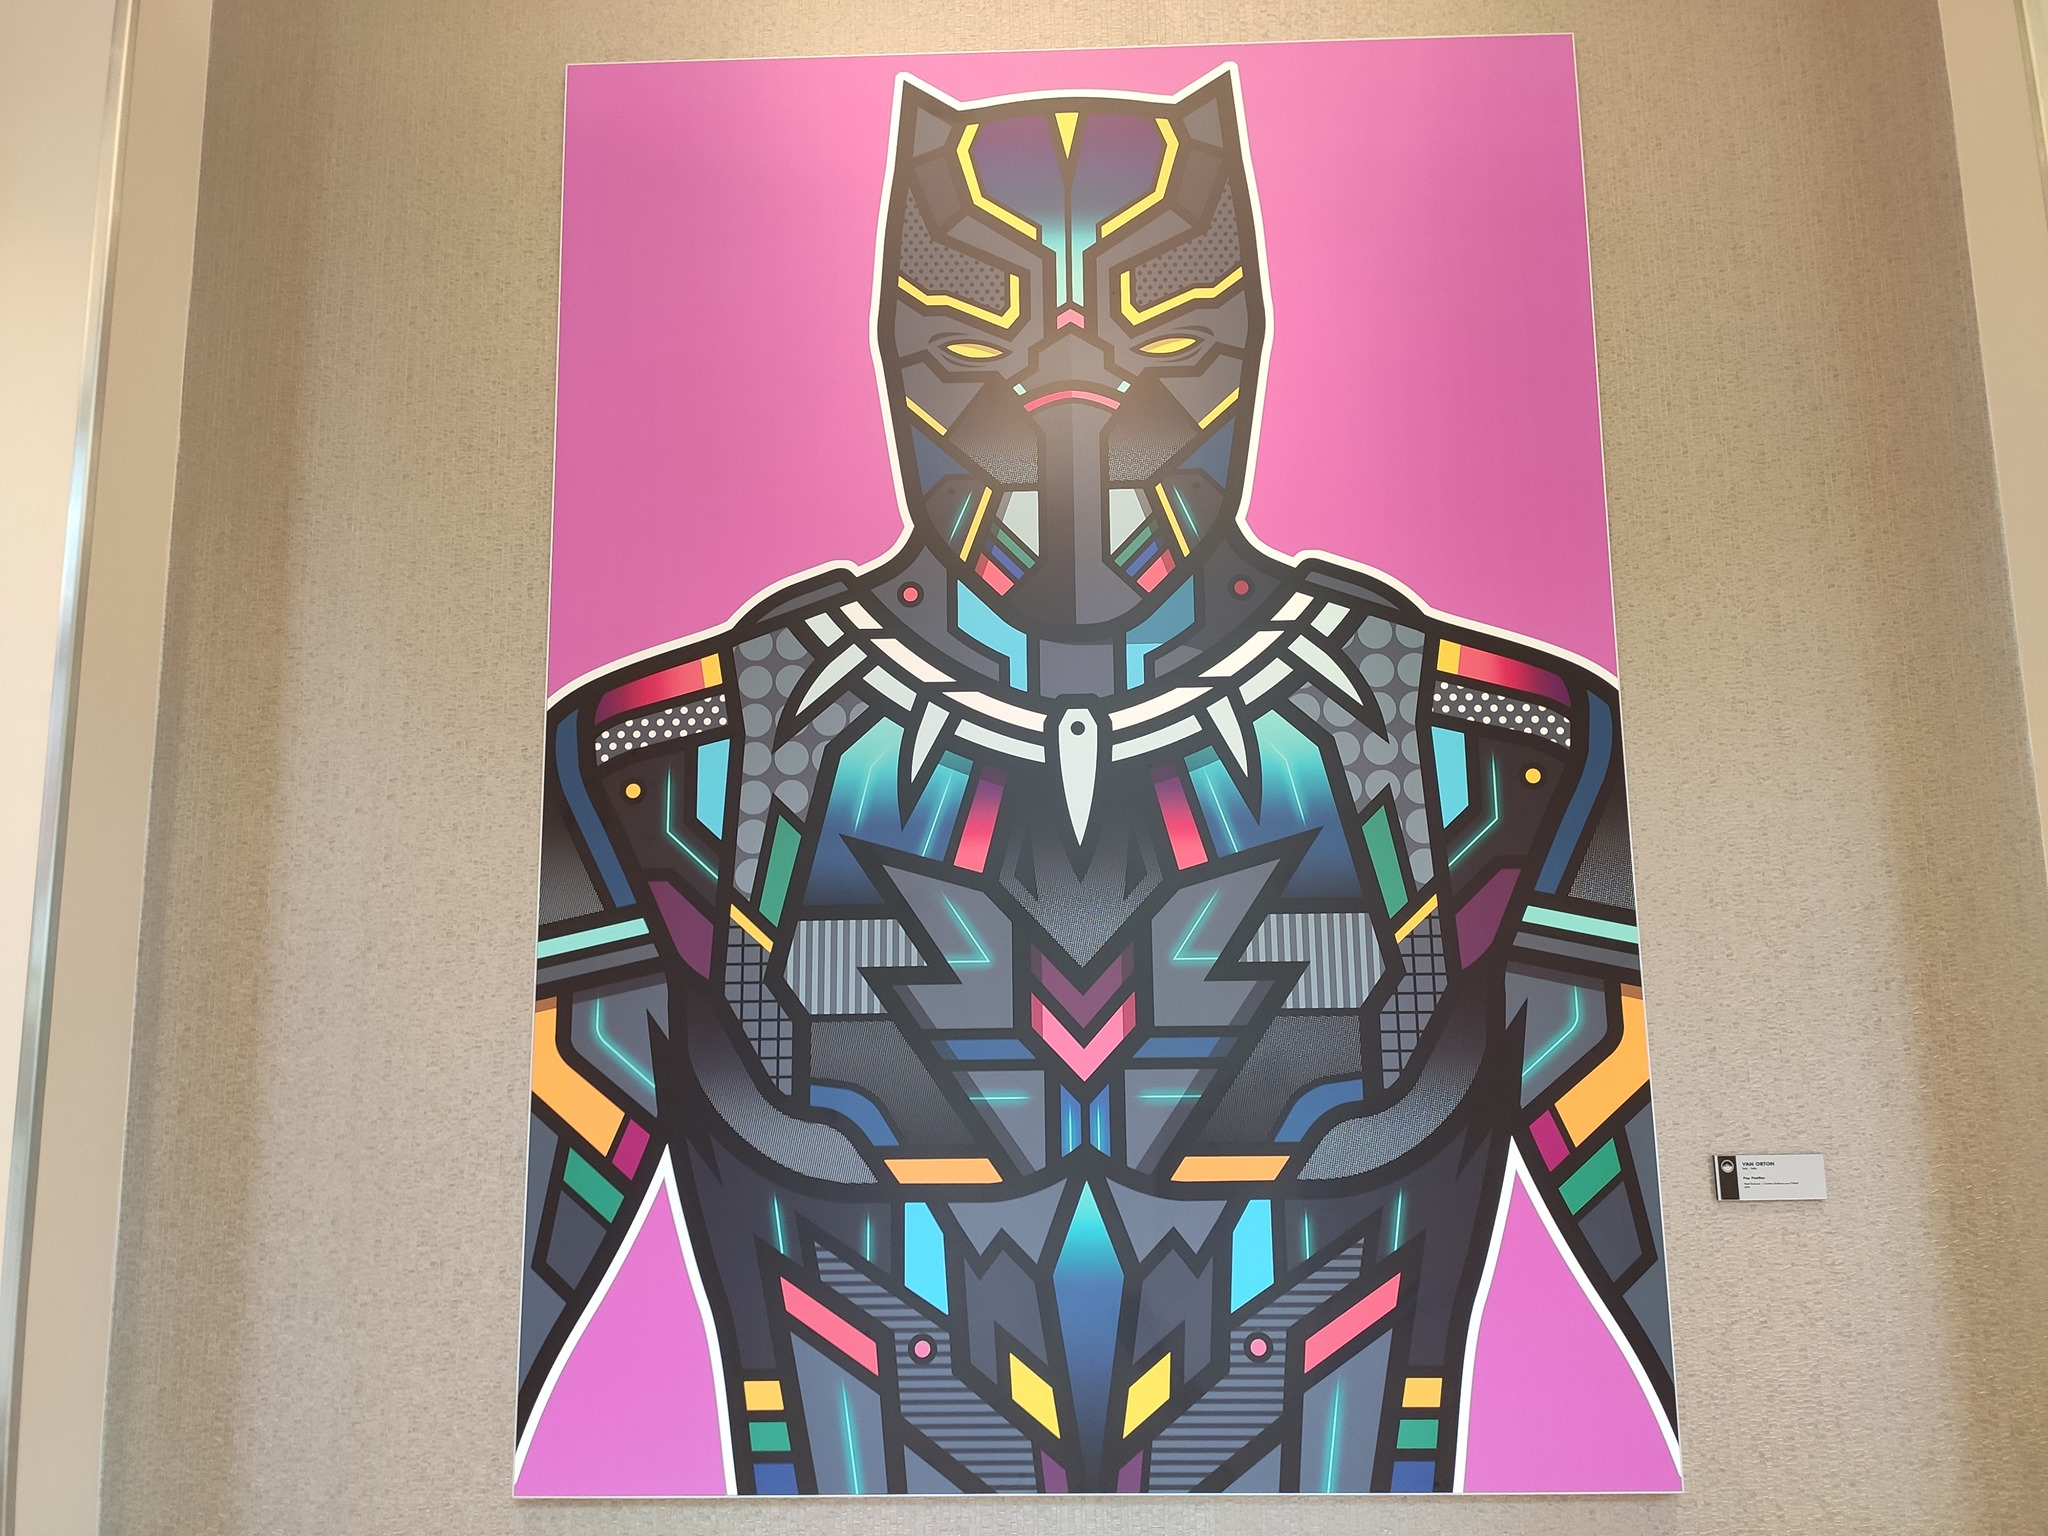 Oeuvres pop art - Disney's Hotel New York - The Art of Marvel